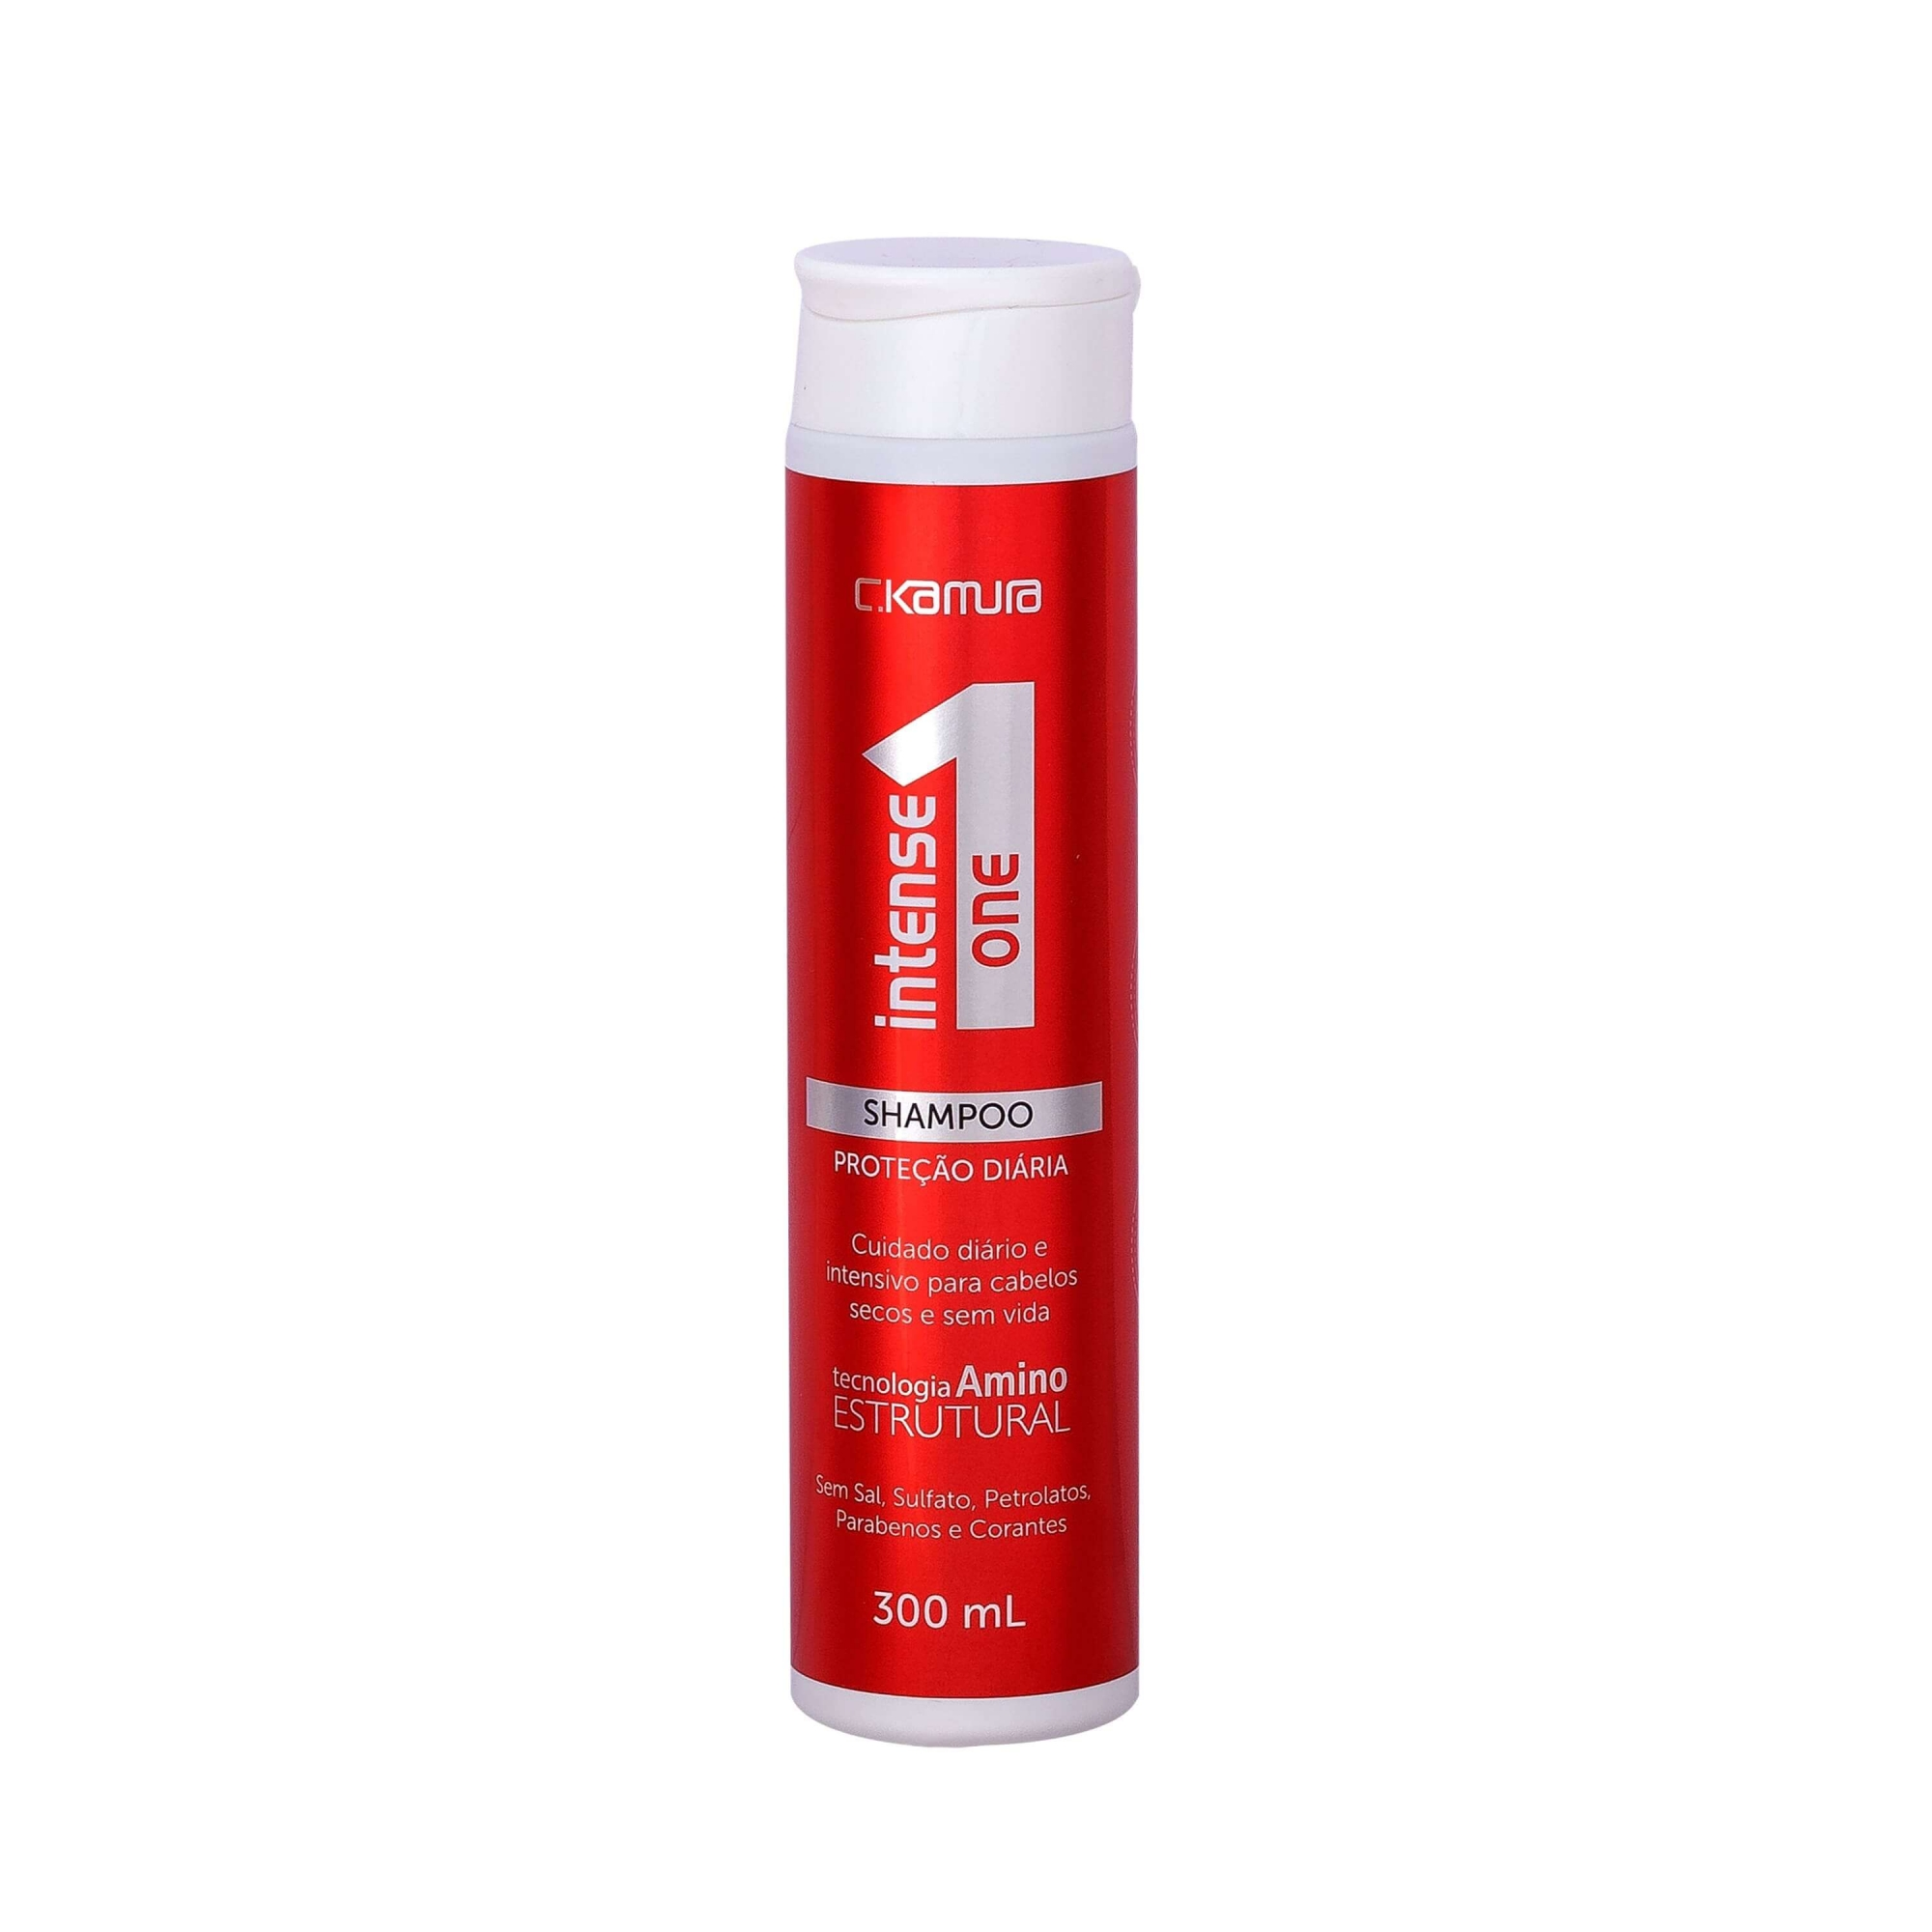 Shampoo Sulfate Free Intense One CKamura 300 Ml